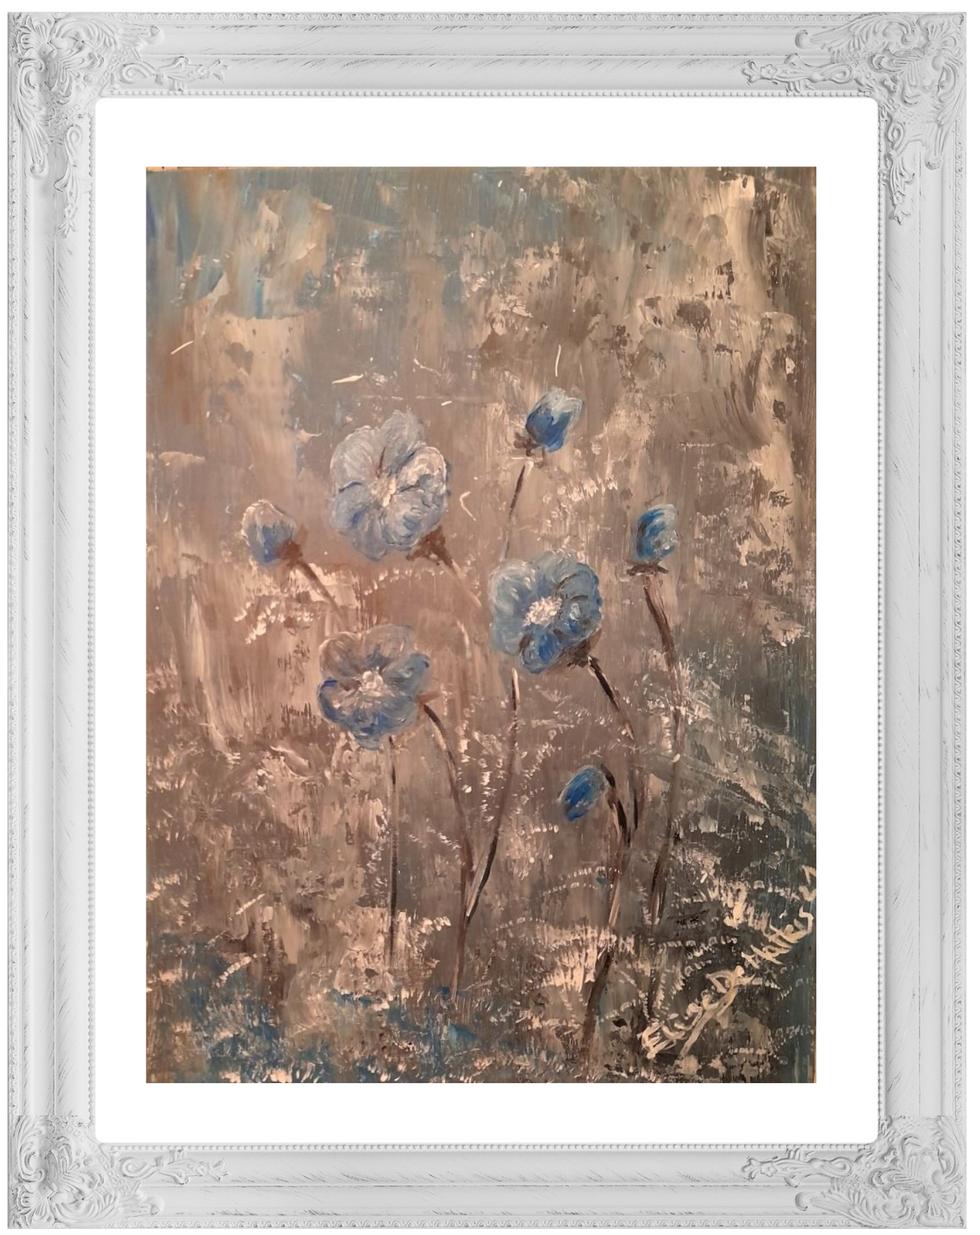 Snow on blue flowers.